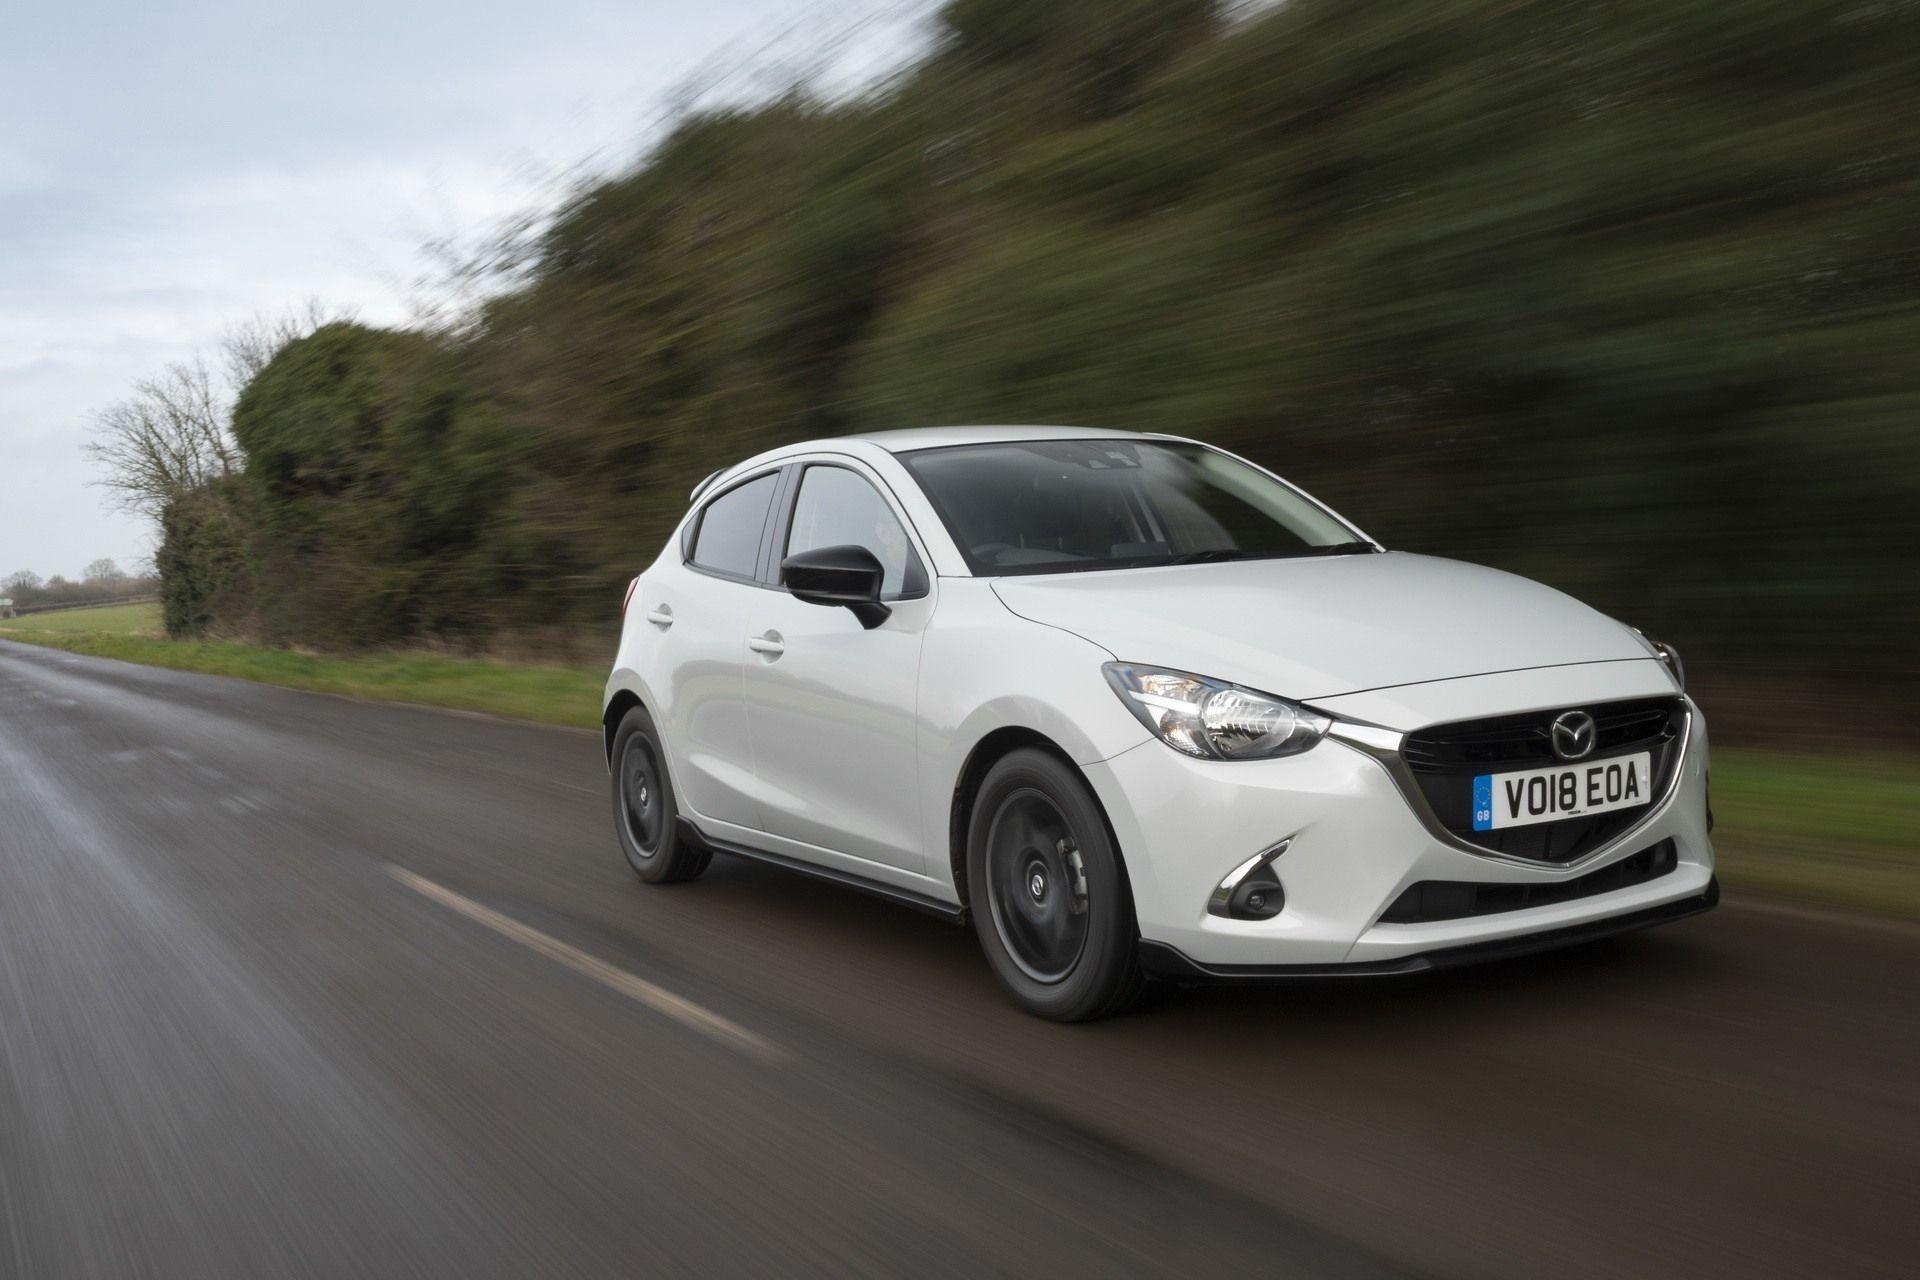 Kelebihan Kekurangan Mazda 2 Hatchback 2018 Spesifikasi